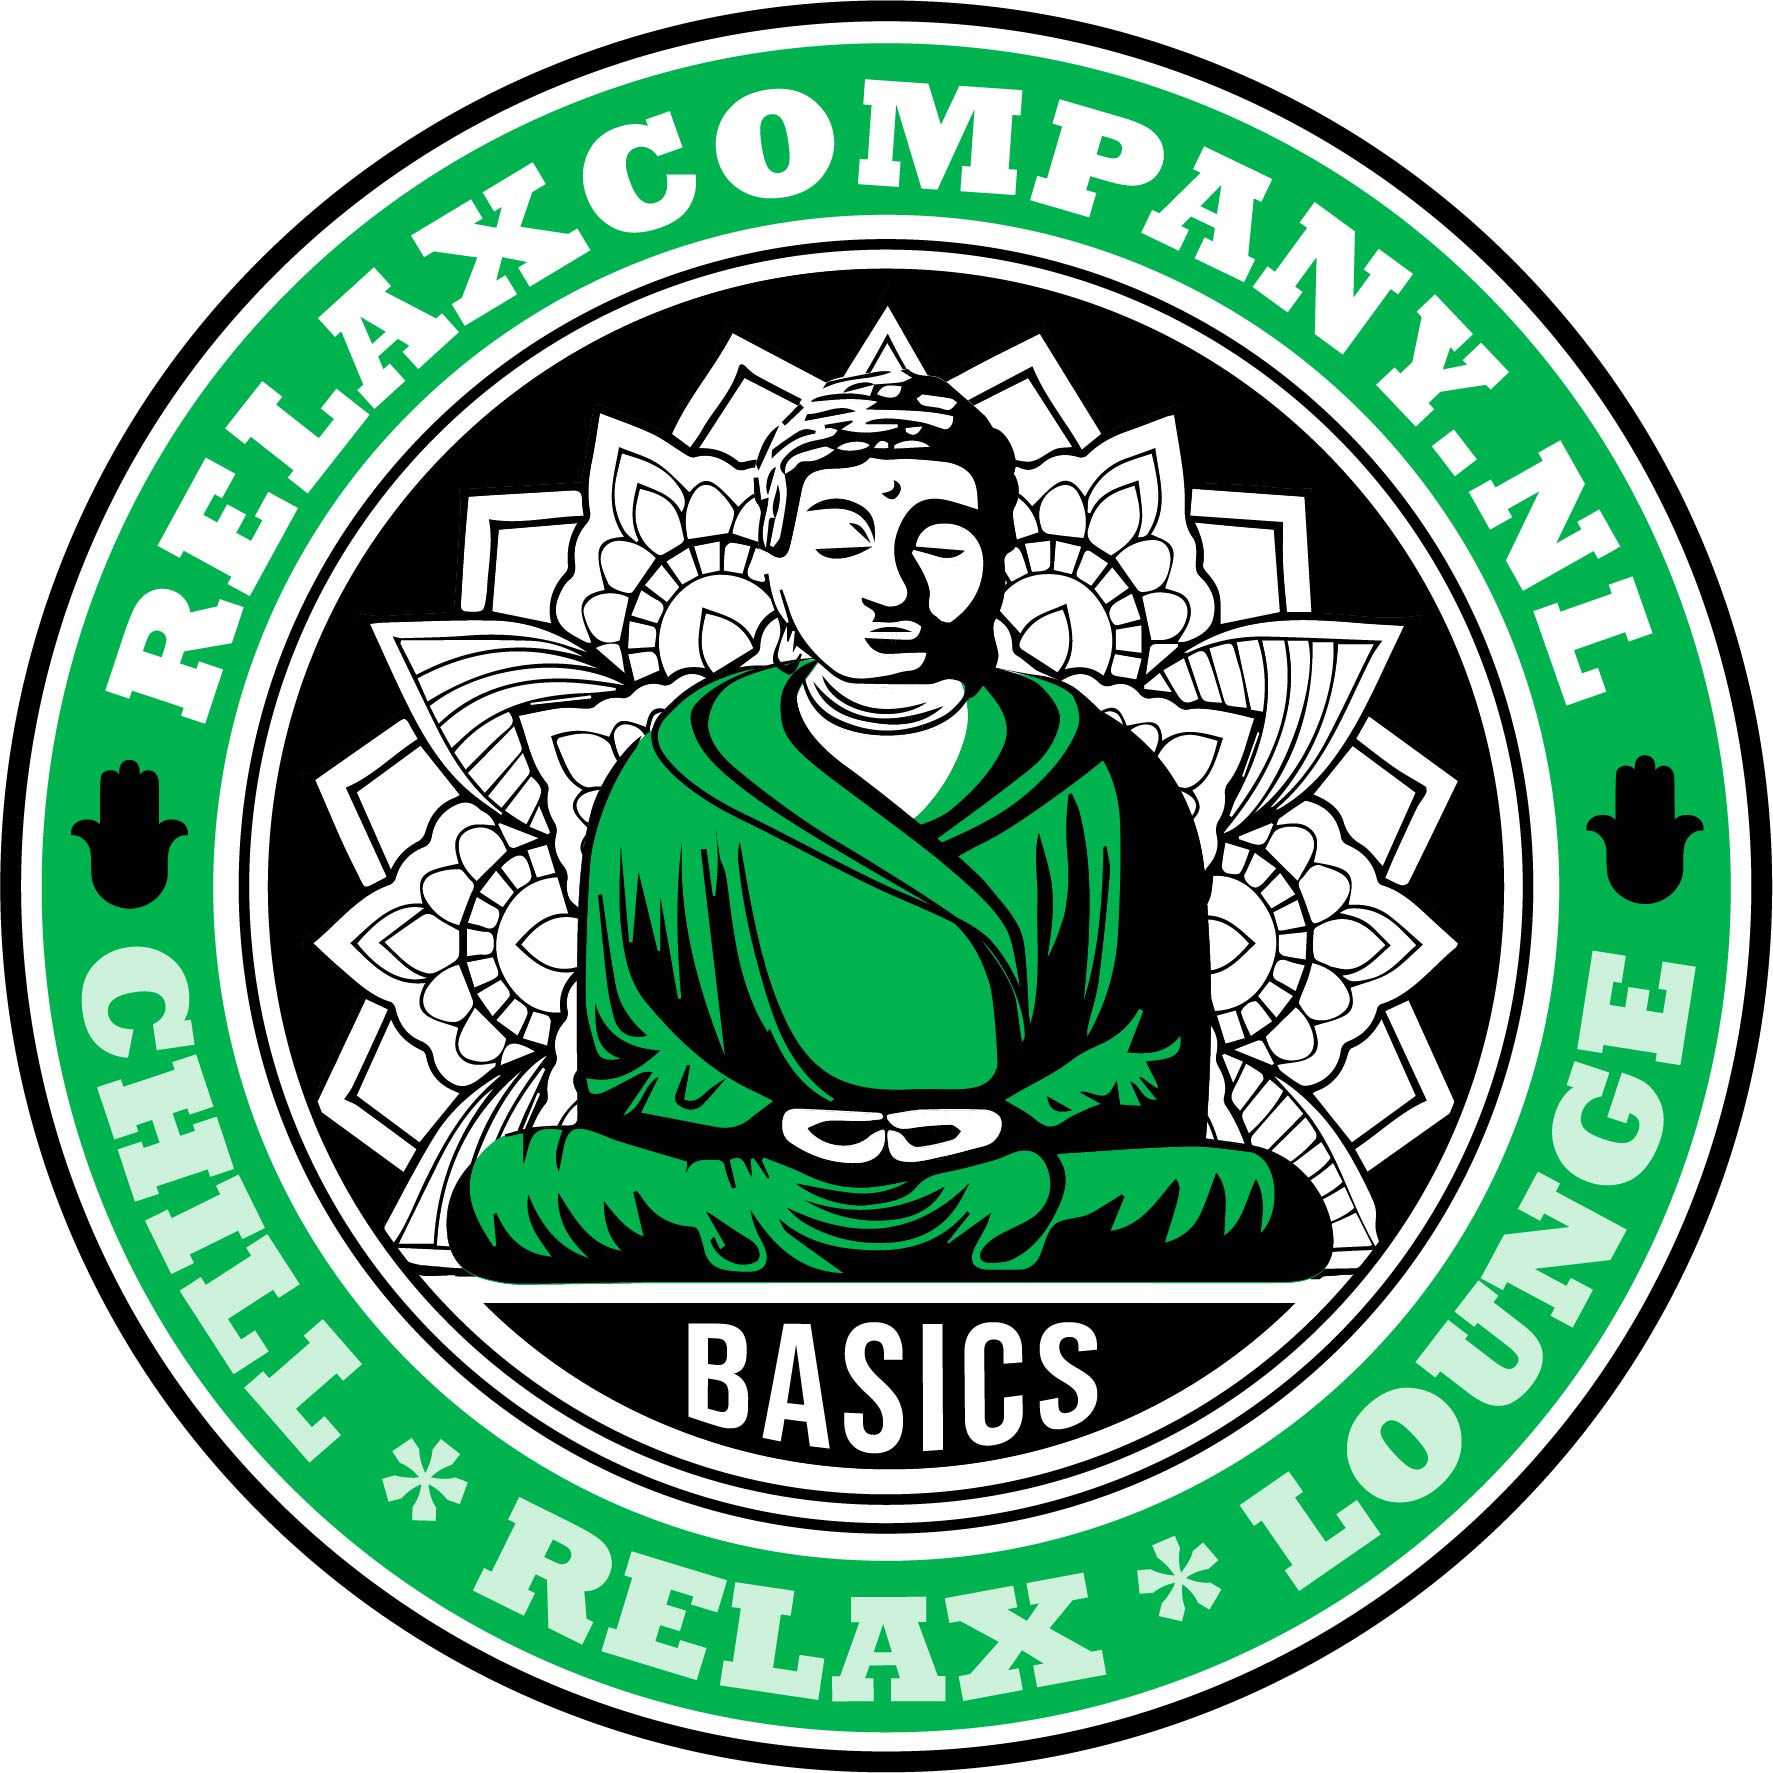 Badjassen relax company